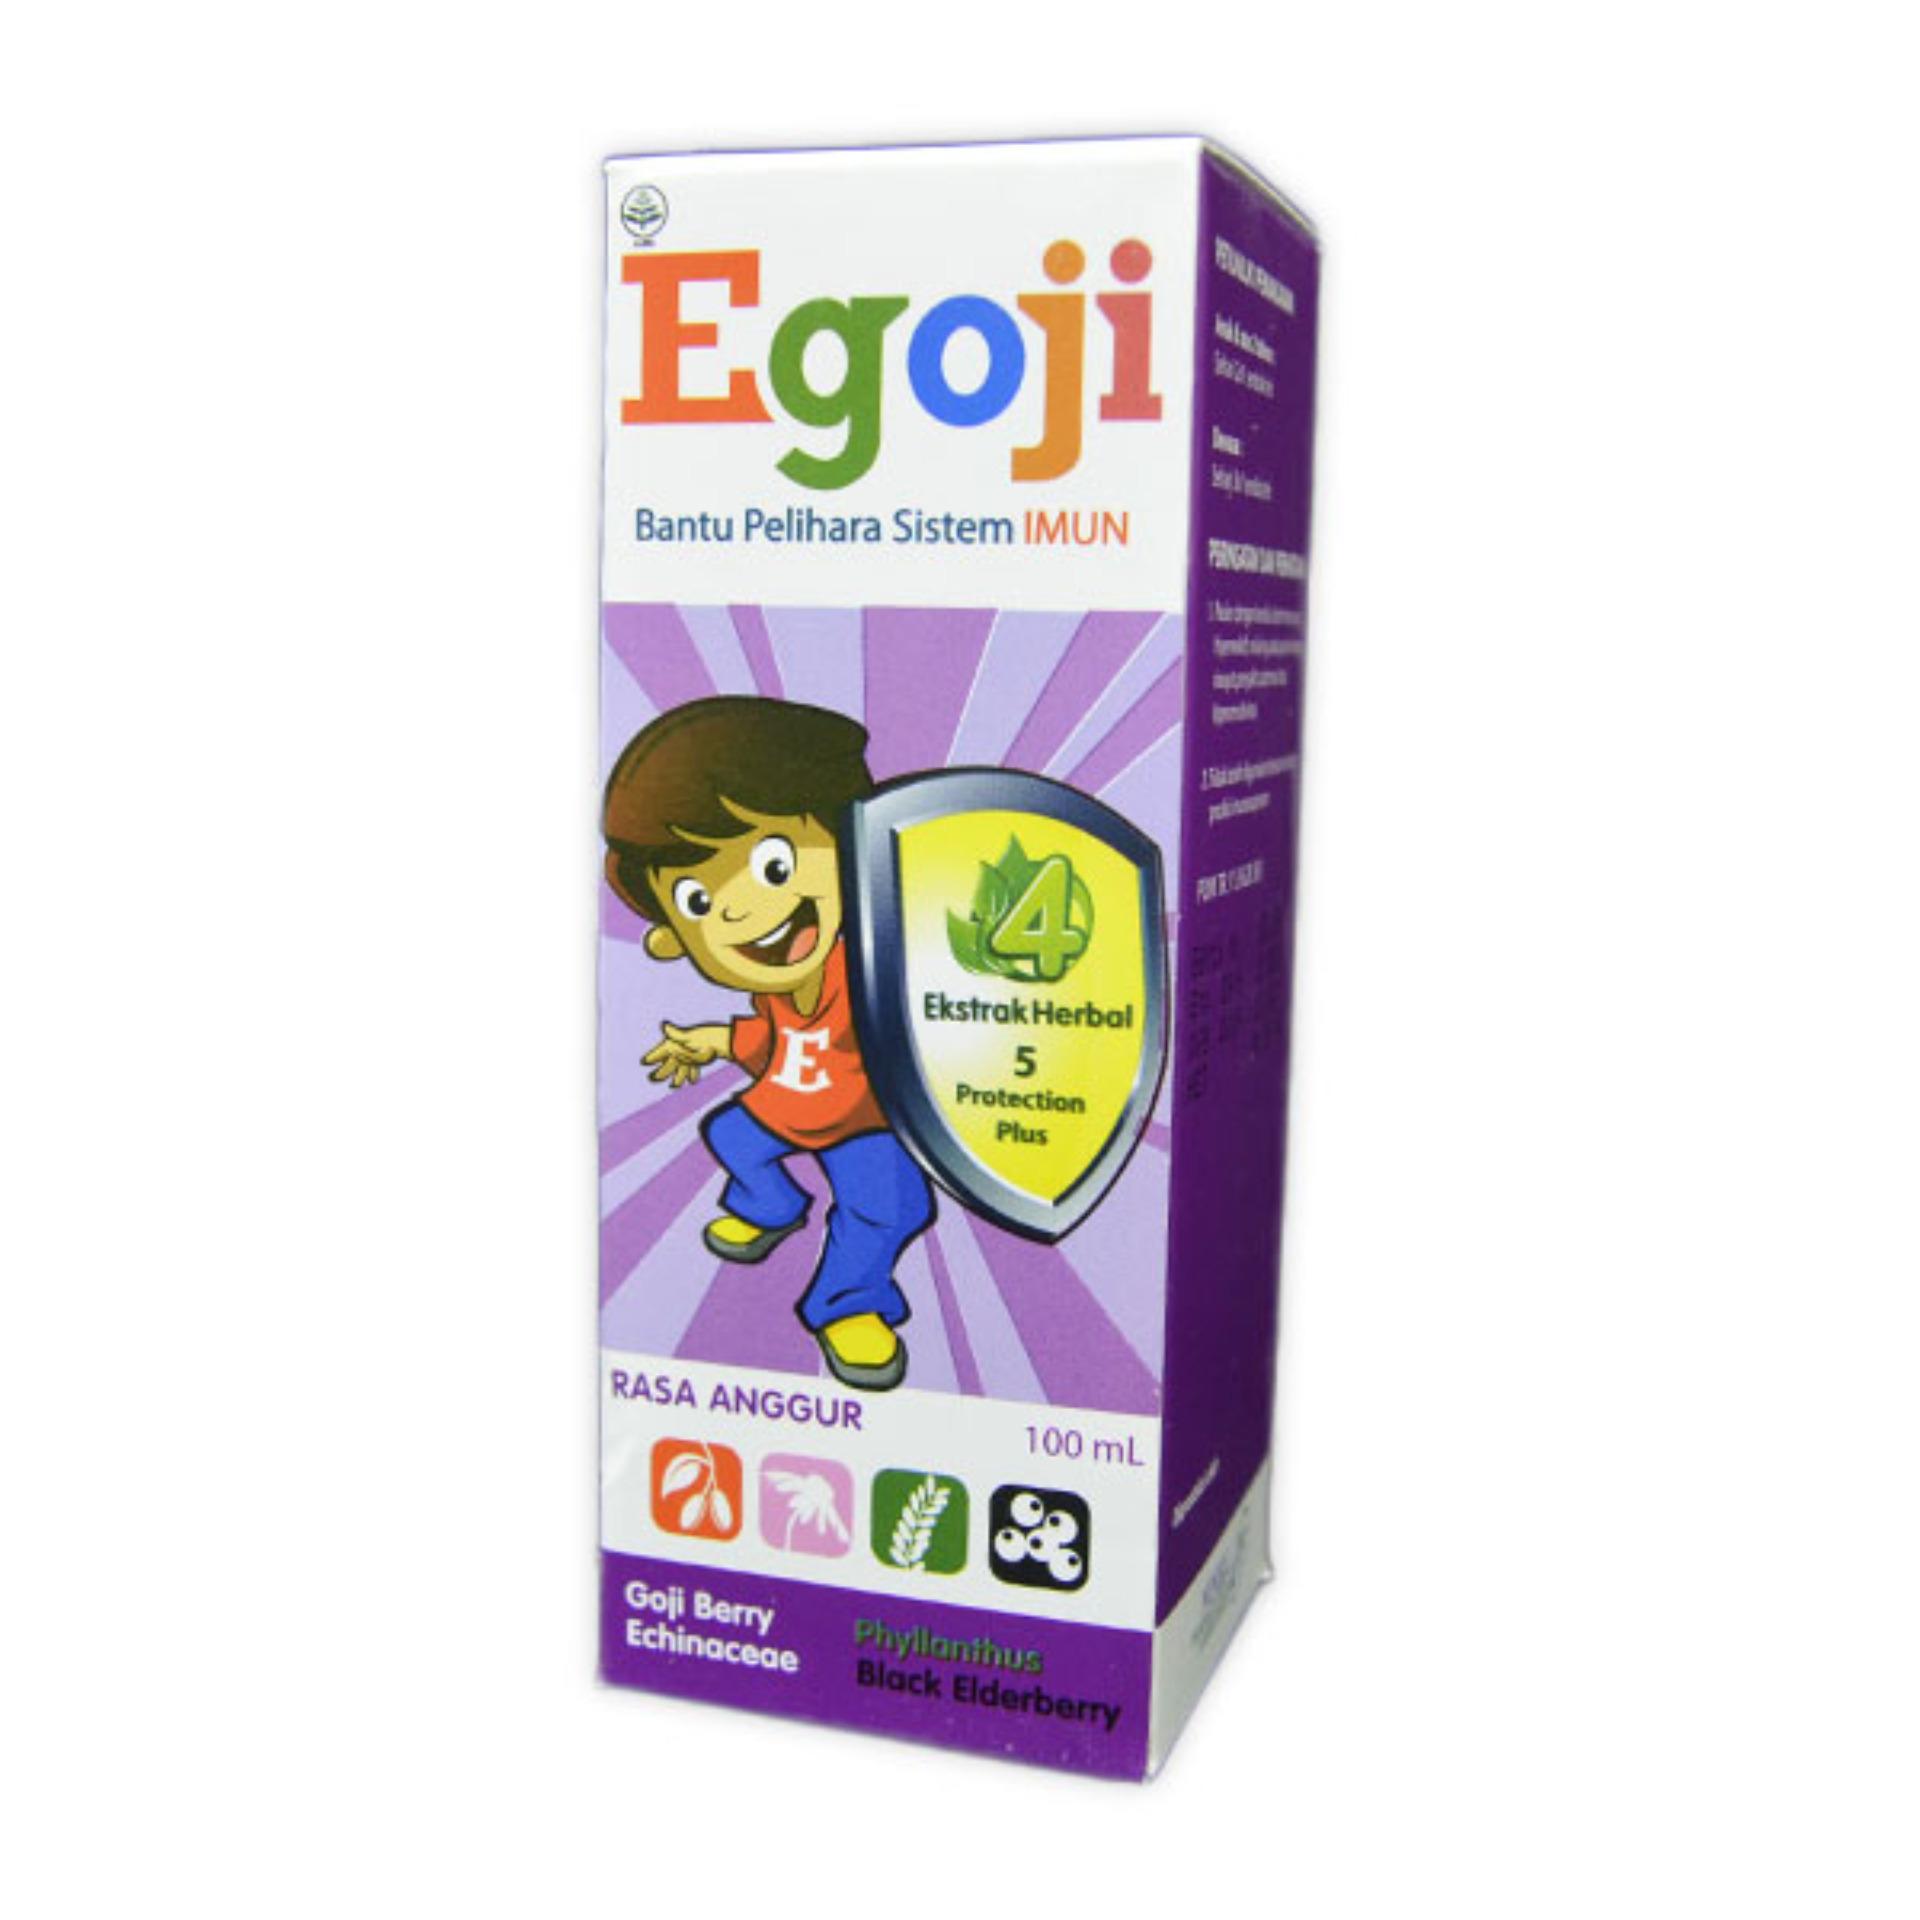 Diskon Penjualan Egoji Syrup Anggur 100 Ml Hot Deals Anakonidin Obh 60